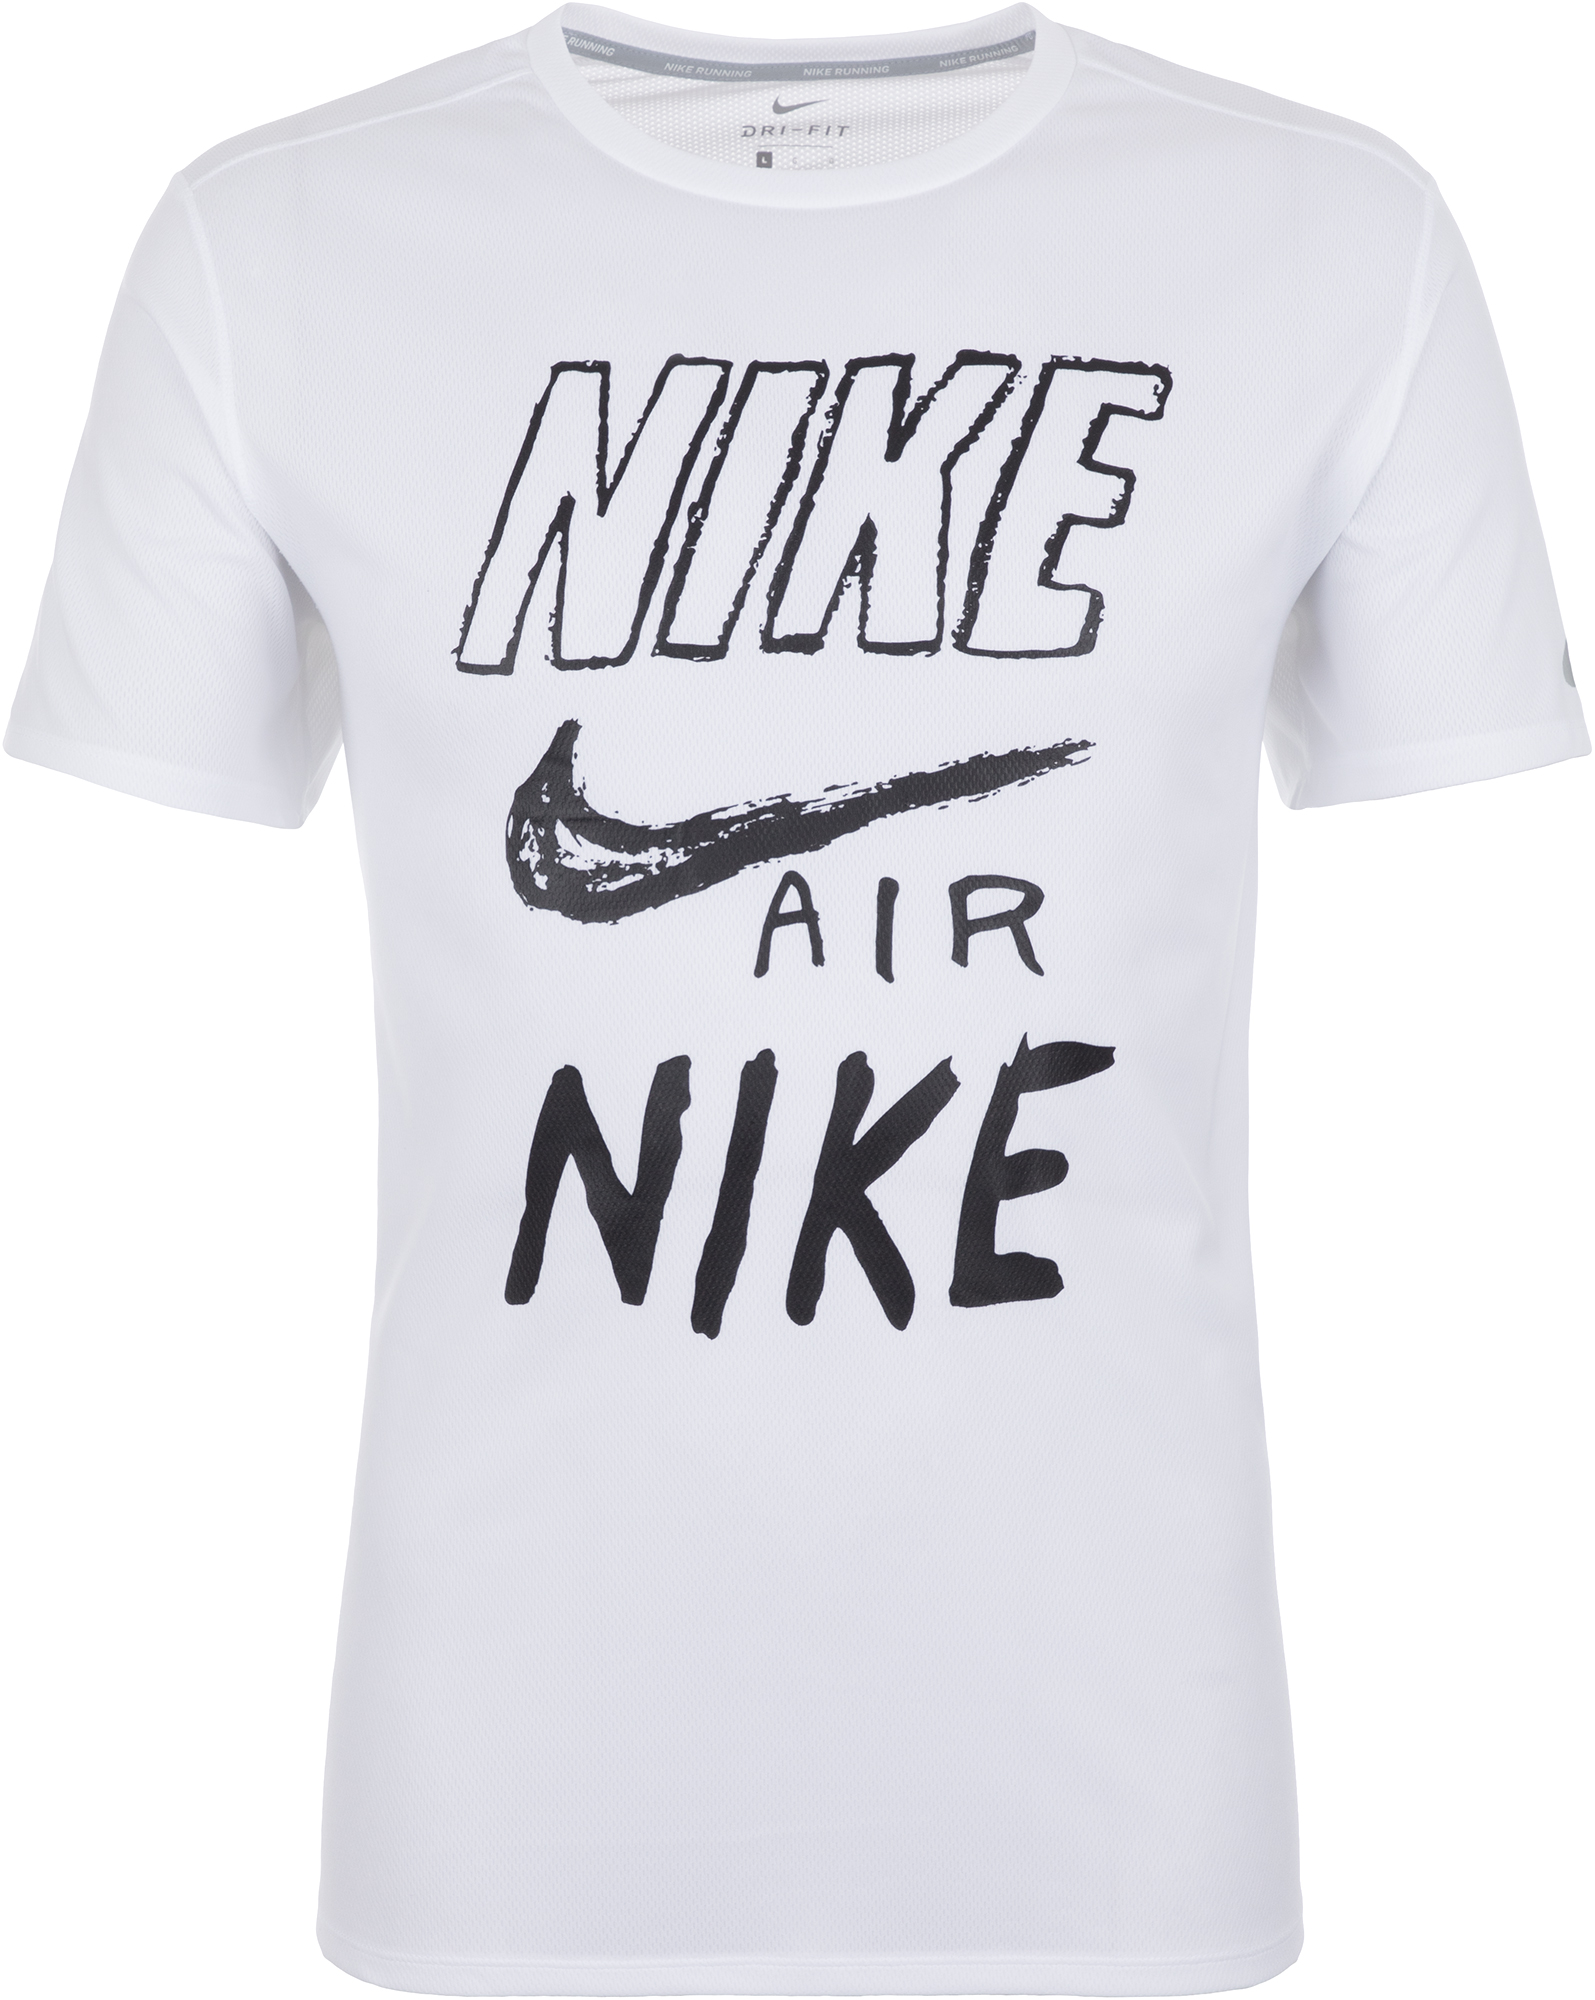 Nike Футболка мужская Nike Breathe, размер 50-52